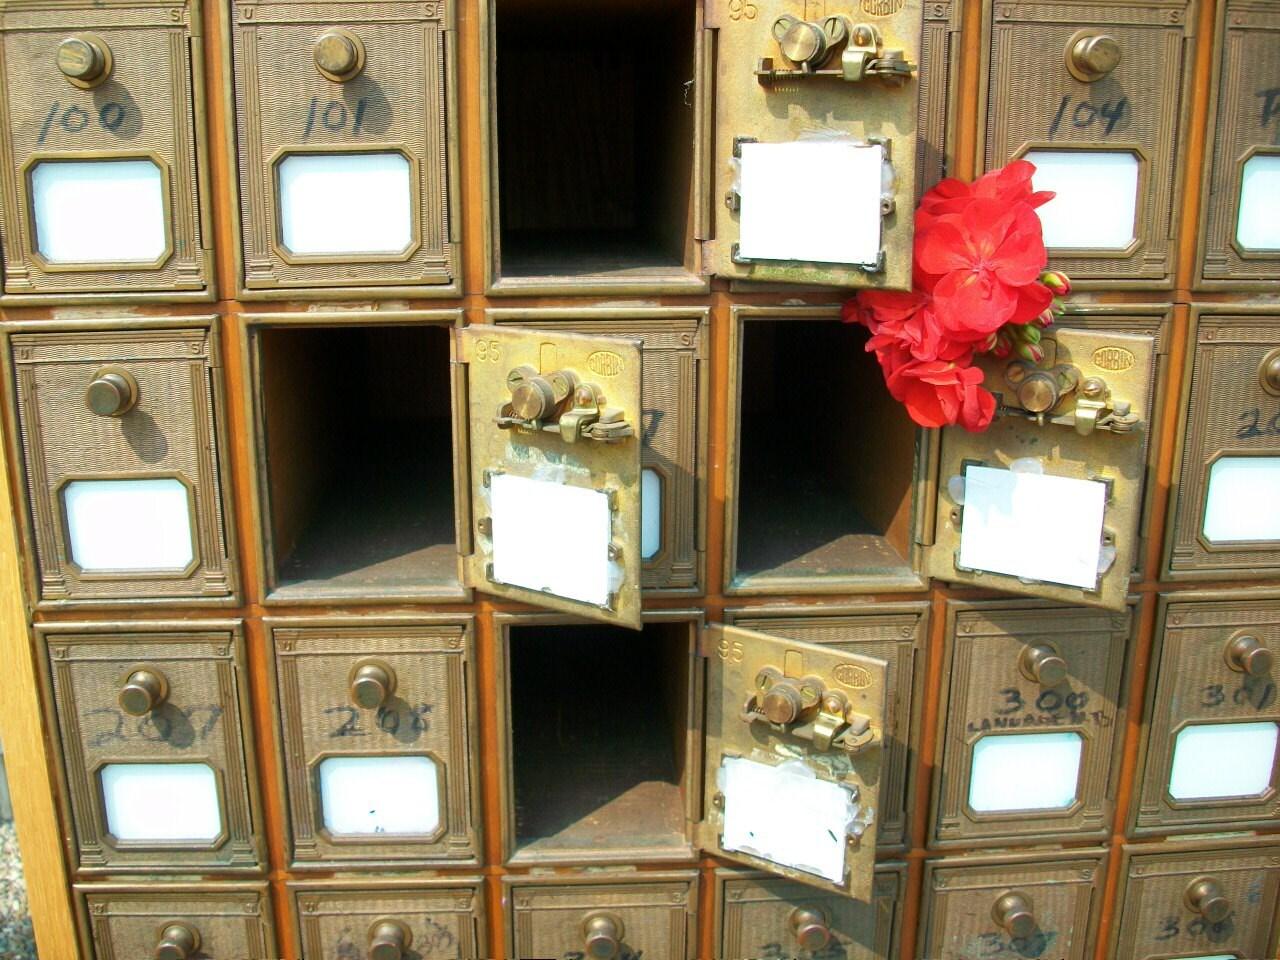 Merveilleux Vintage Post Office / Hotel Mailbox From The 1960u0027s U2013 Antique Mail Box U2013  Collectible Home Decor U2013 Home And Living U2013 Vintage Postal U2013 Haute Juice